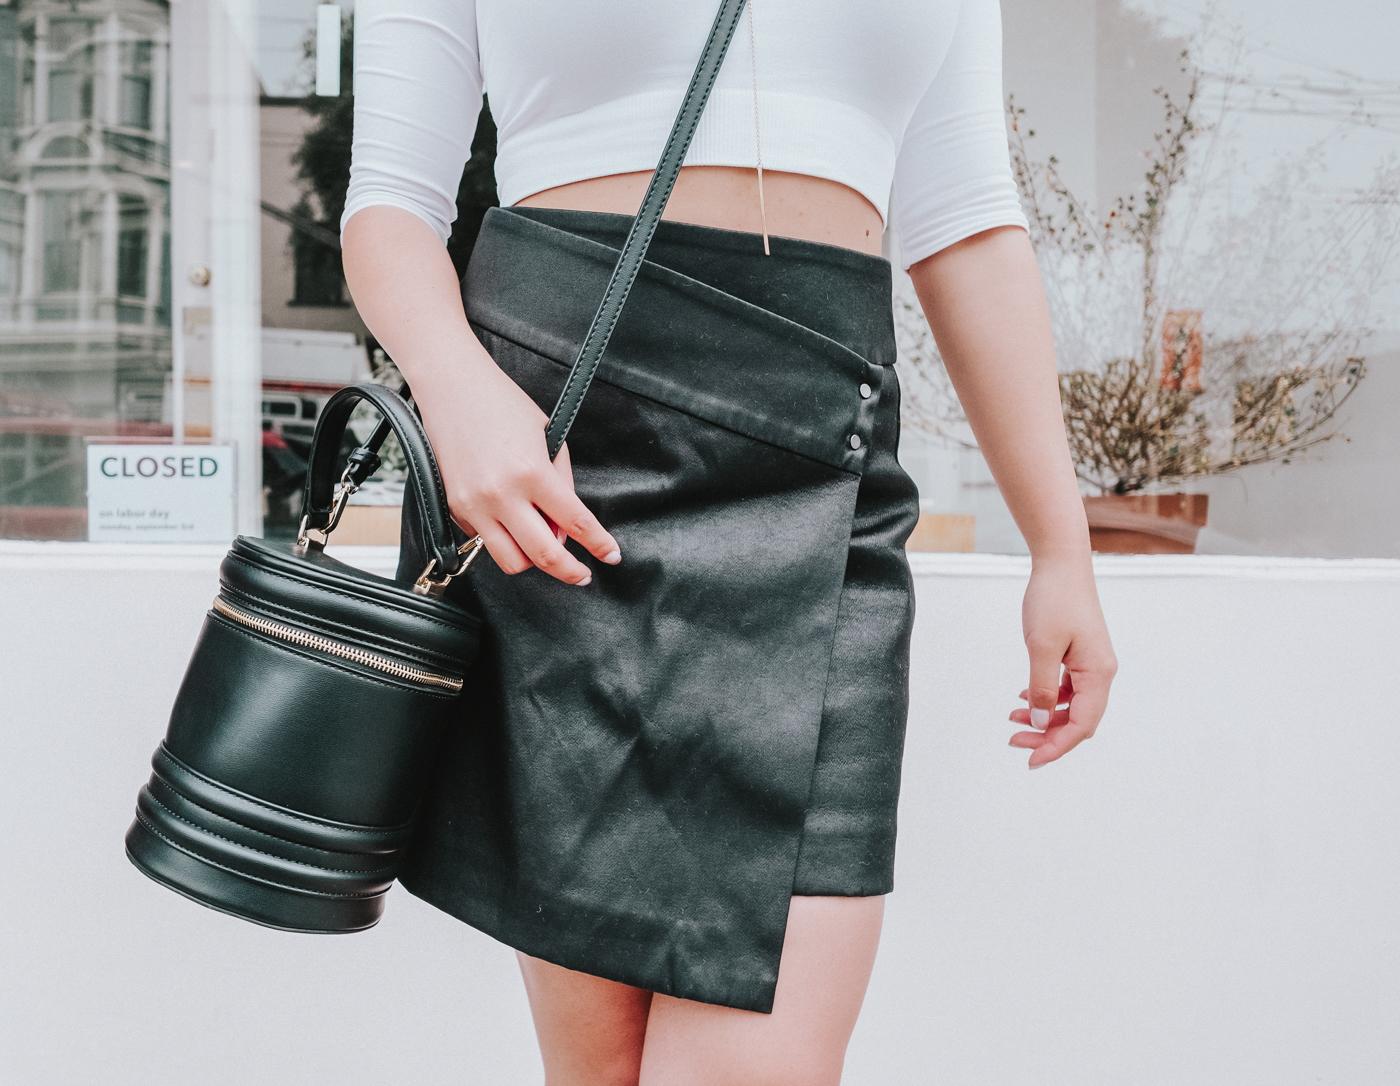 Melie Bianco Crossbody Bag   The Chic Diary